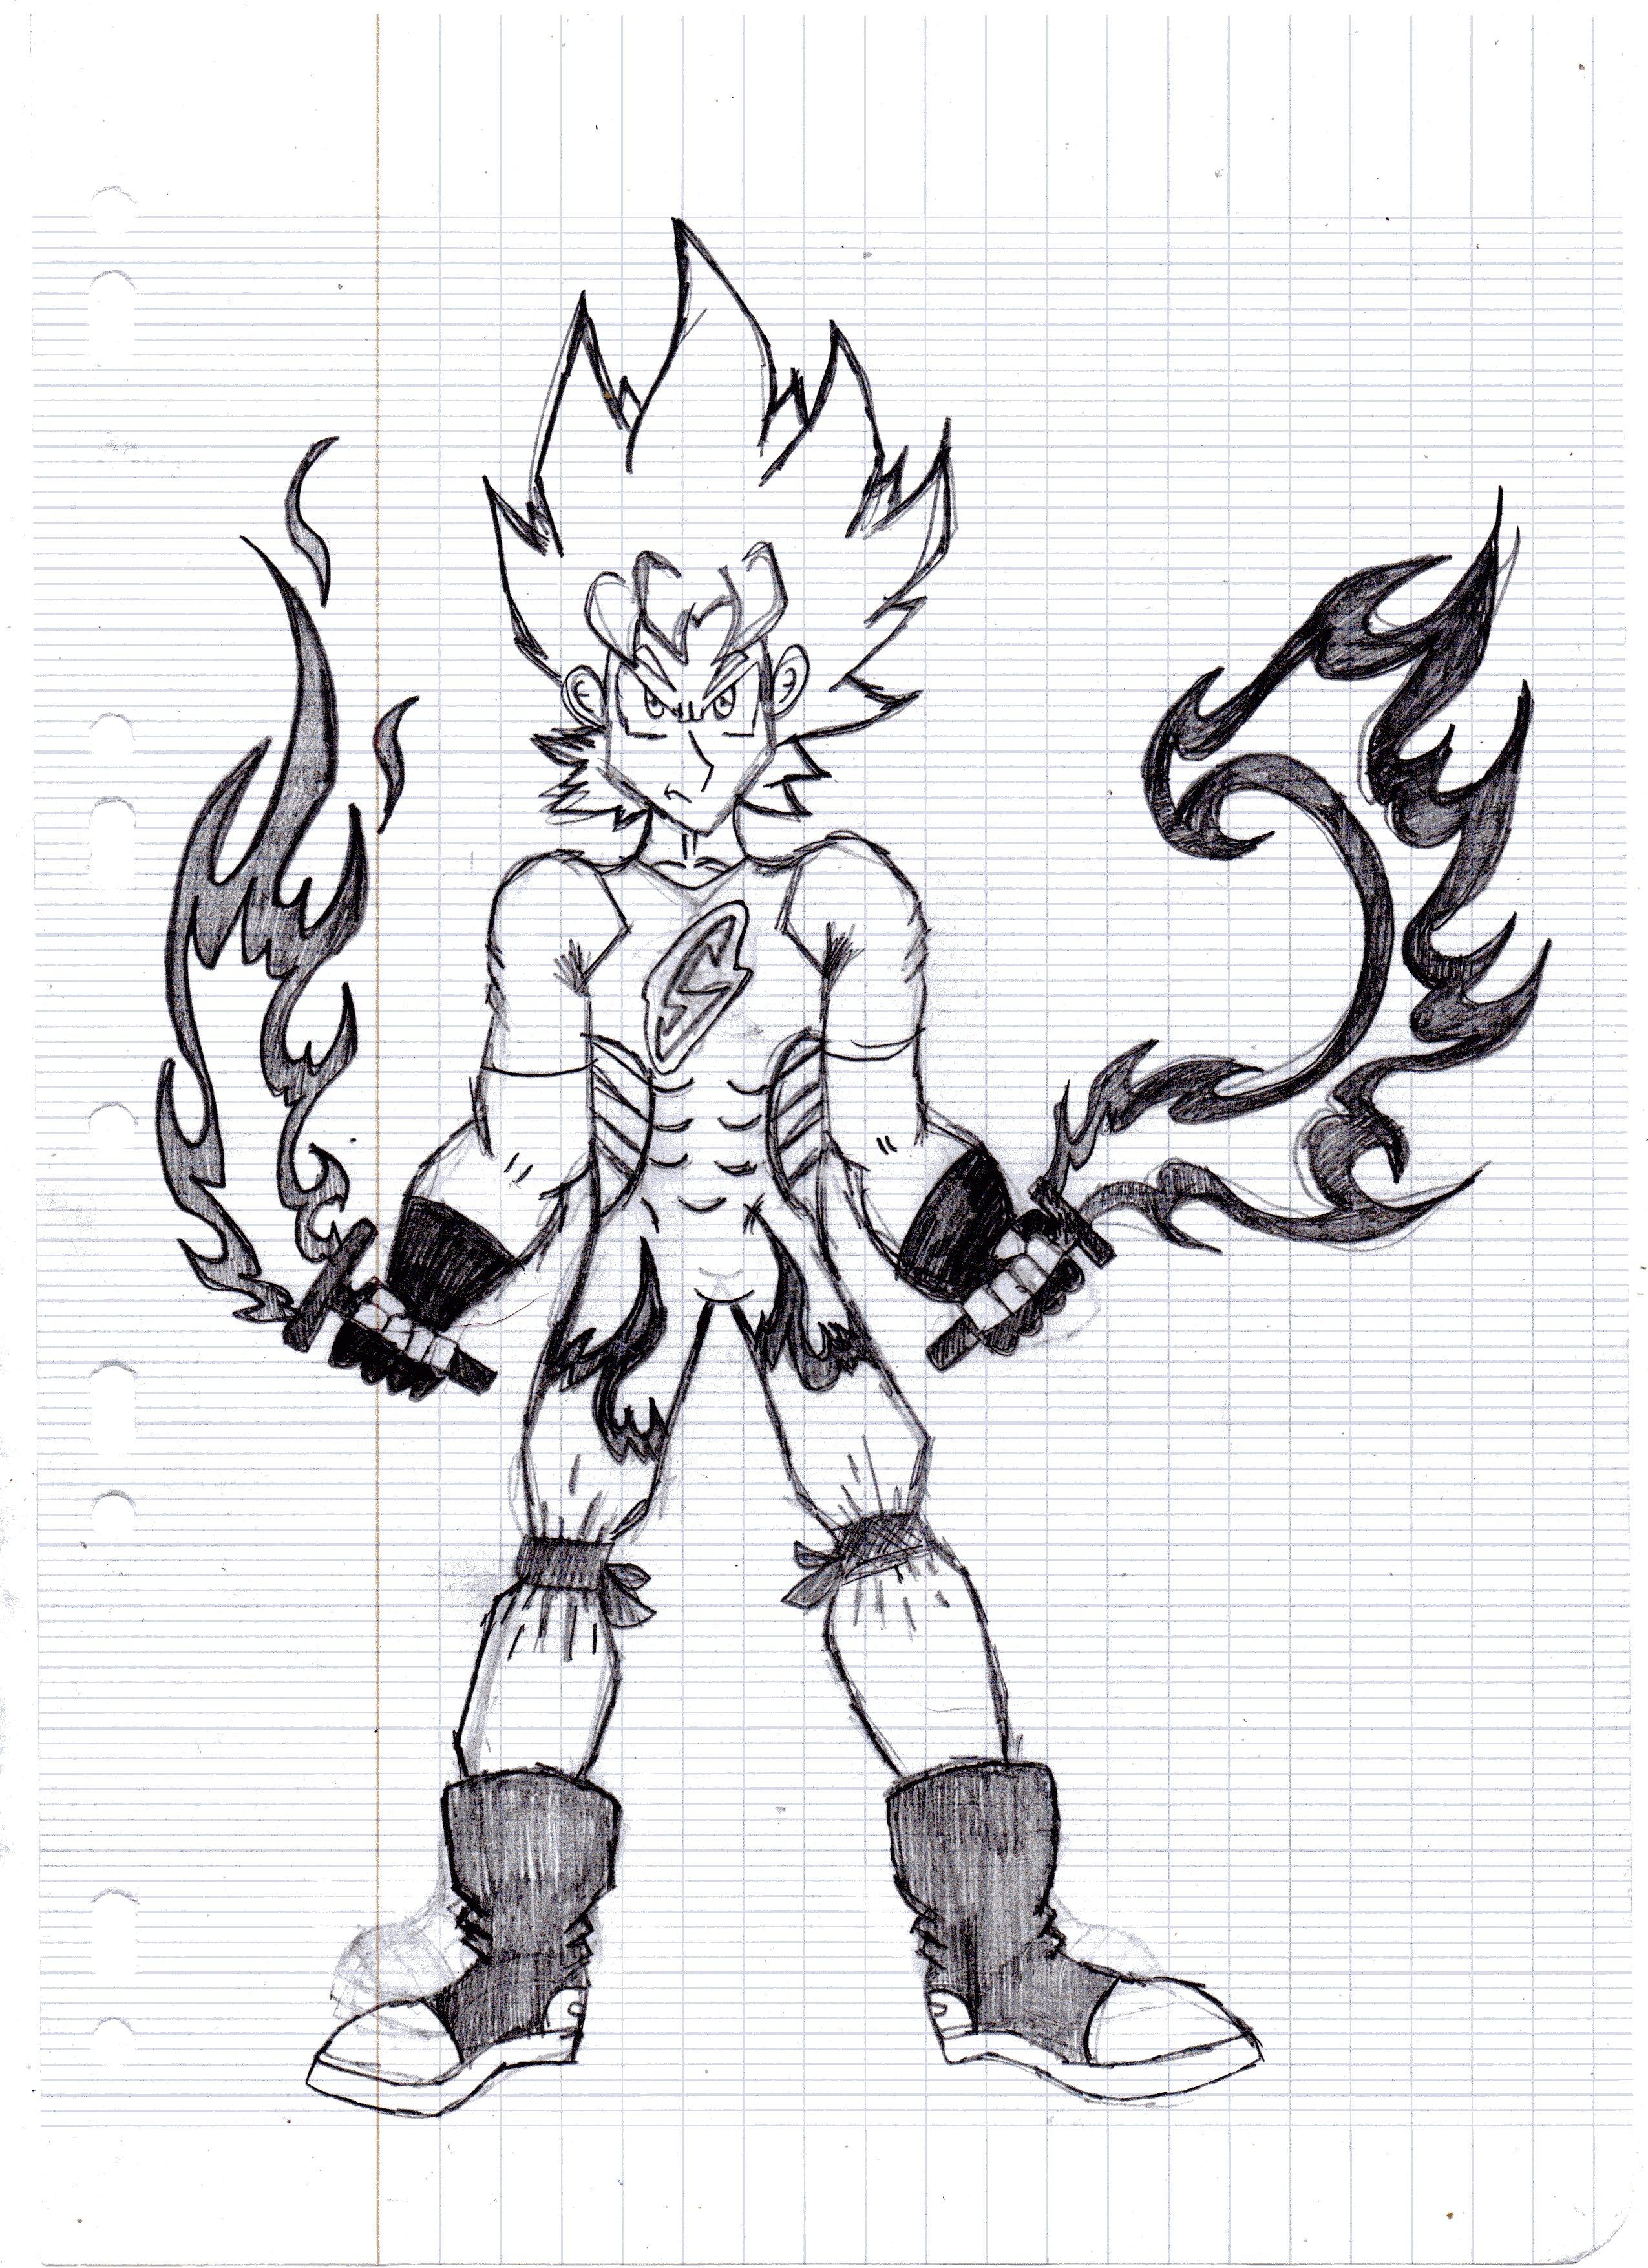 Super Fire Star !